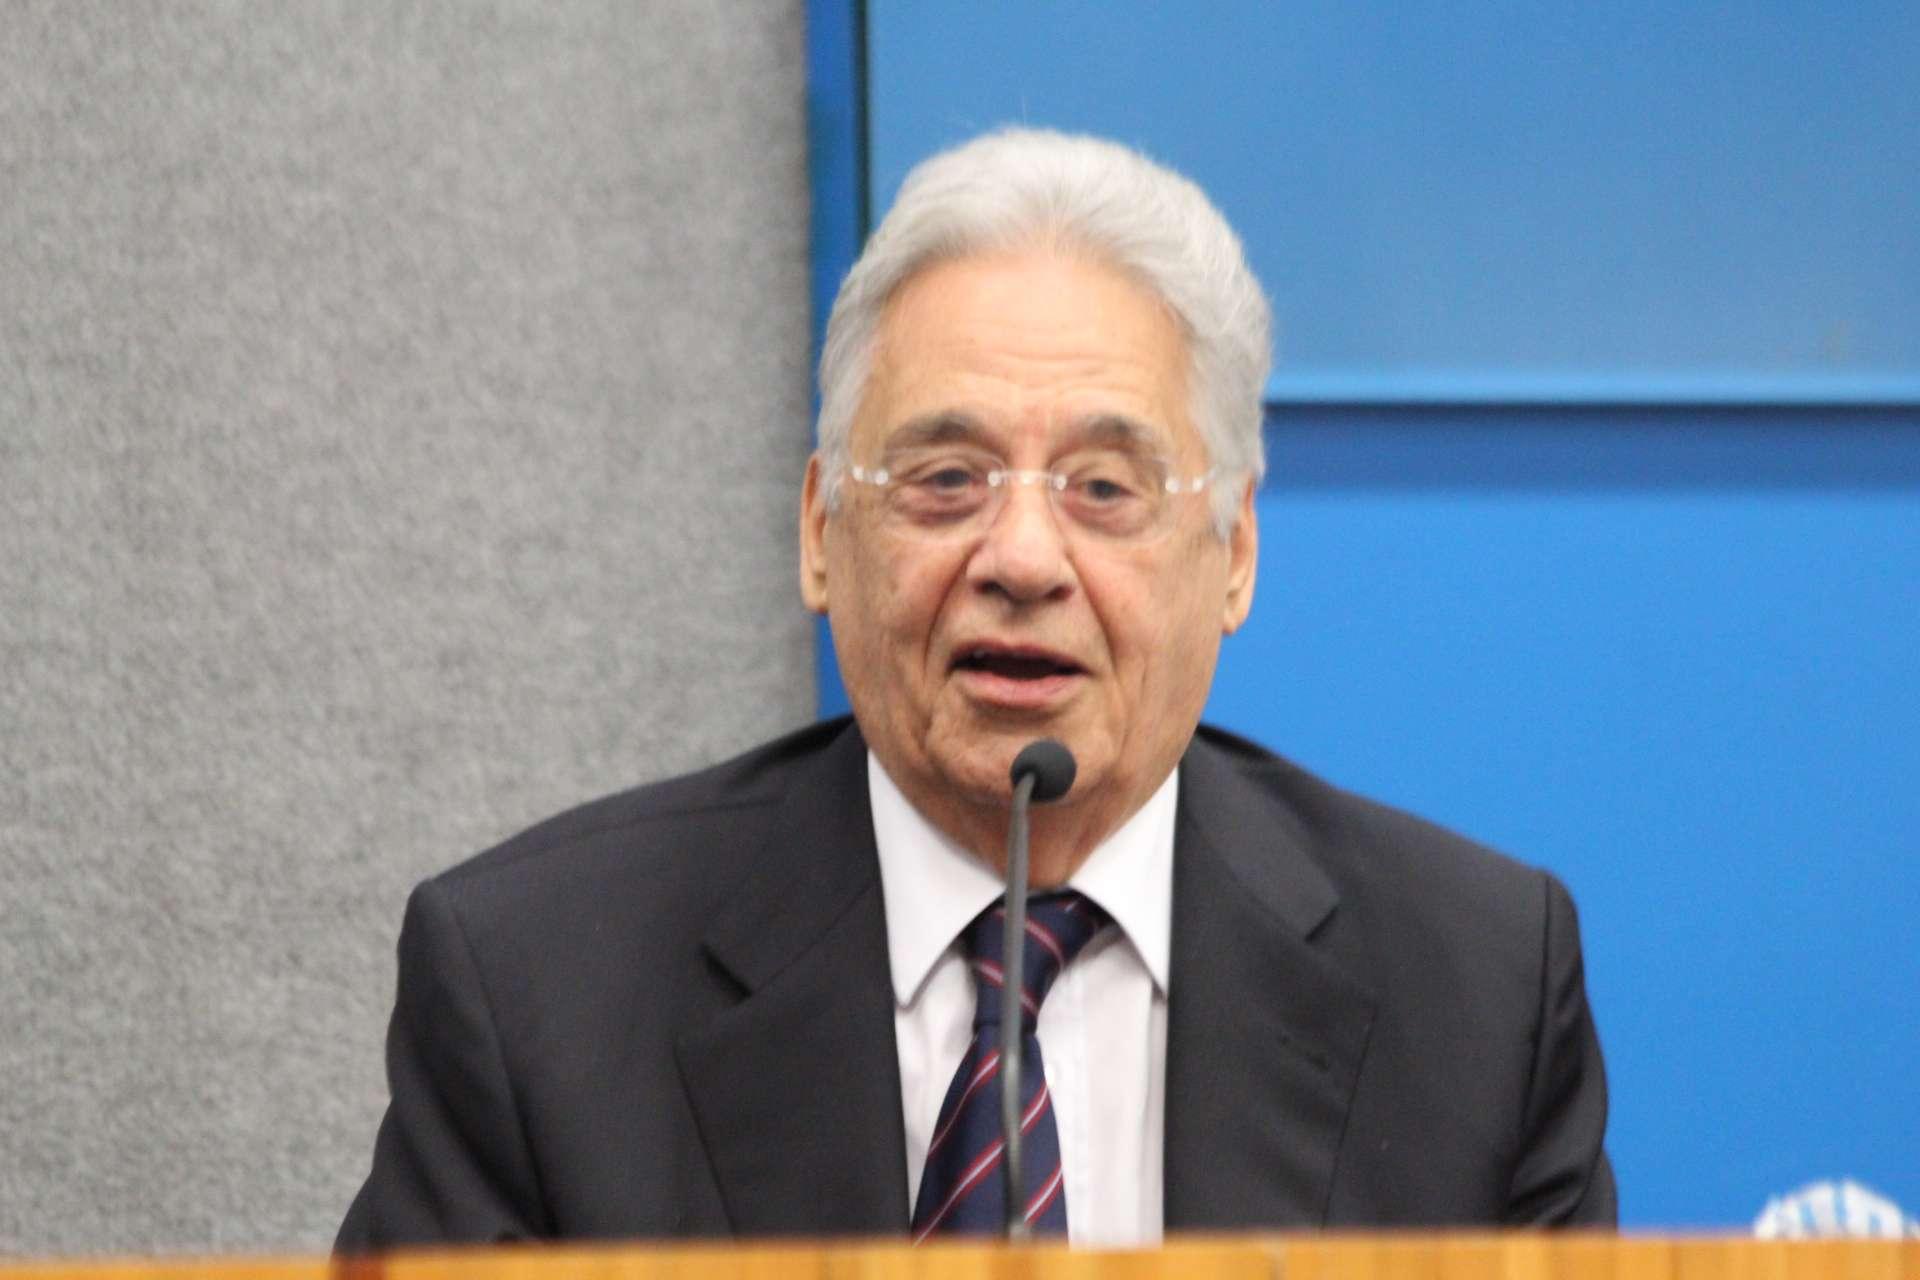 Ex-presidente, Fernando Henrique Cardoso é professor aposentado da USP desde 1968 Foto: Janaina Garcia/Terra